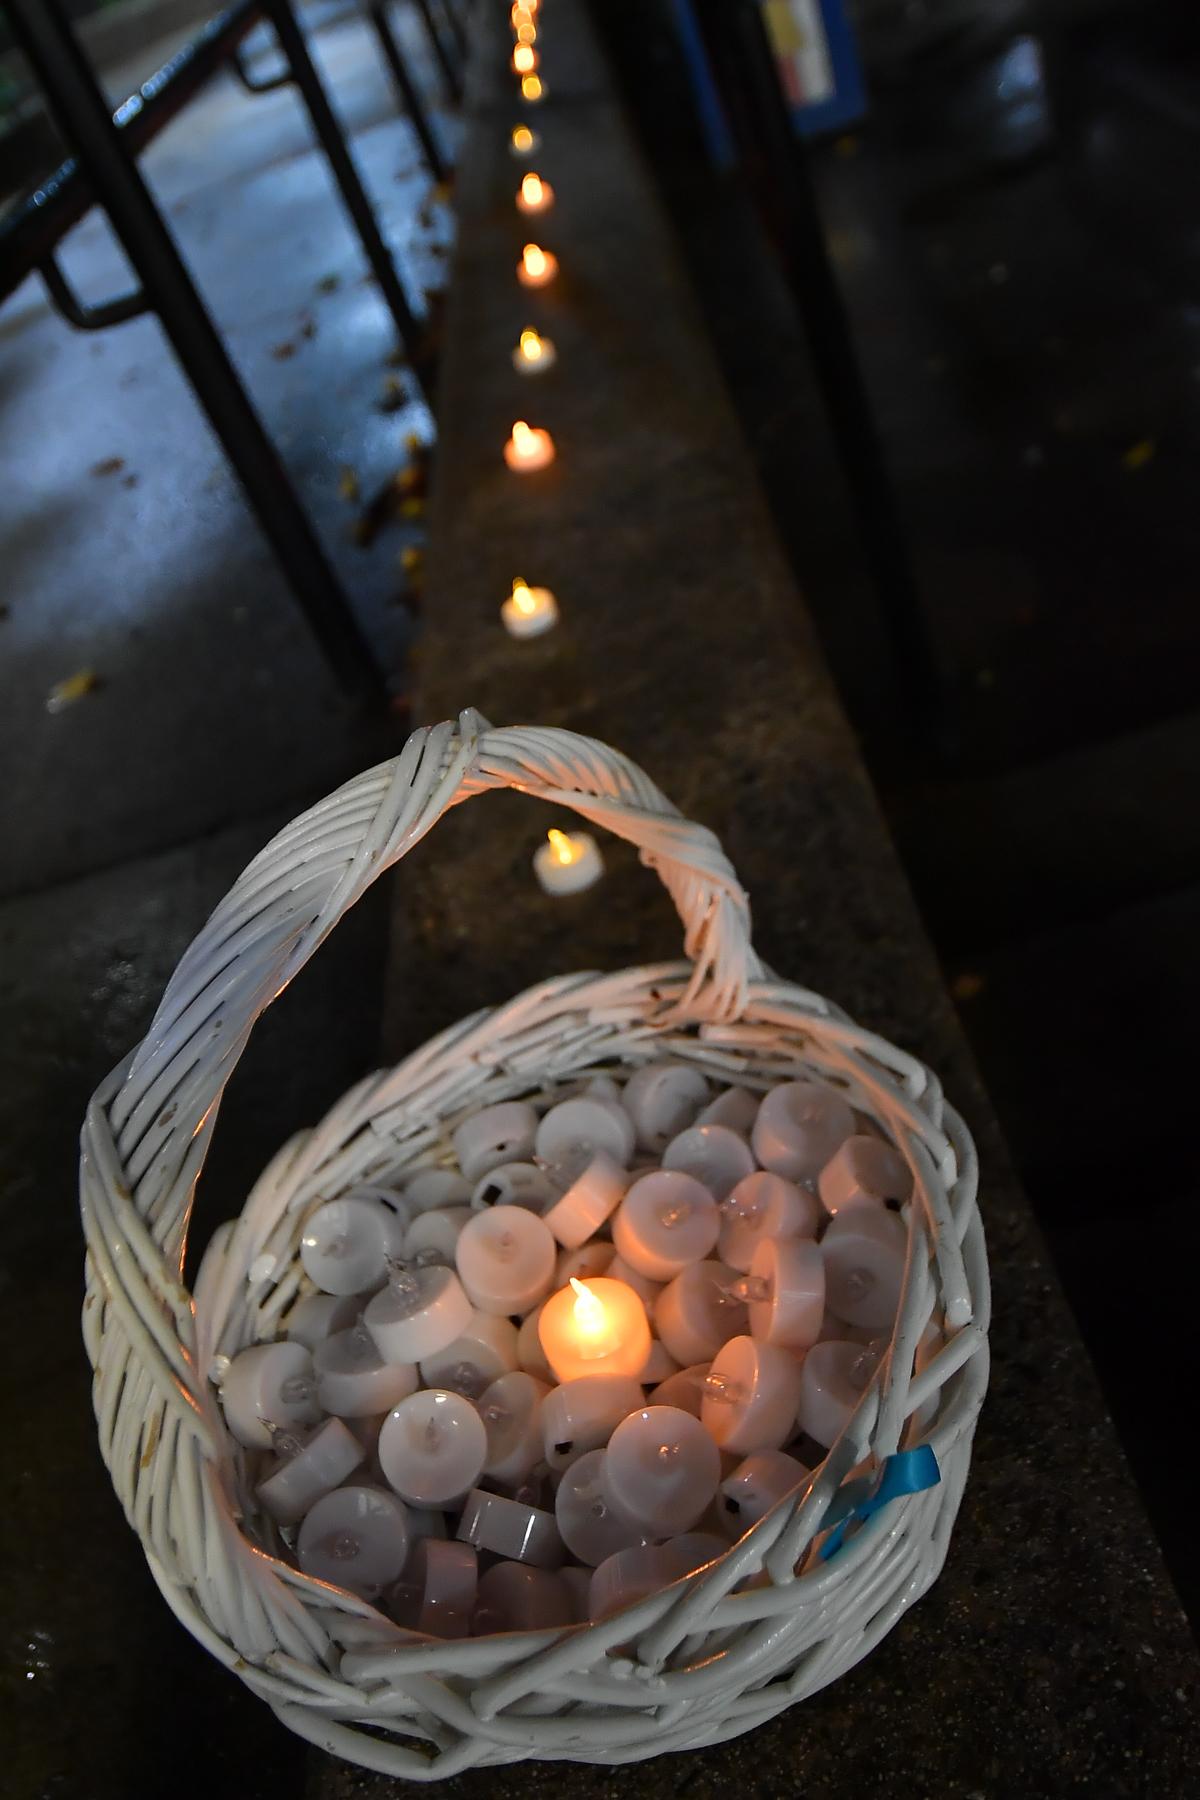 moas-4th-annual-candlelight-memorial-vigil_30249708137_o.jpg